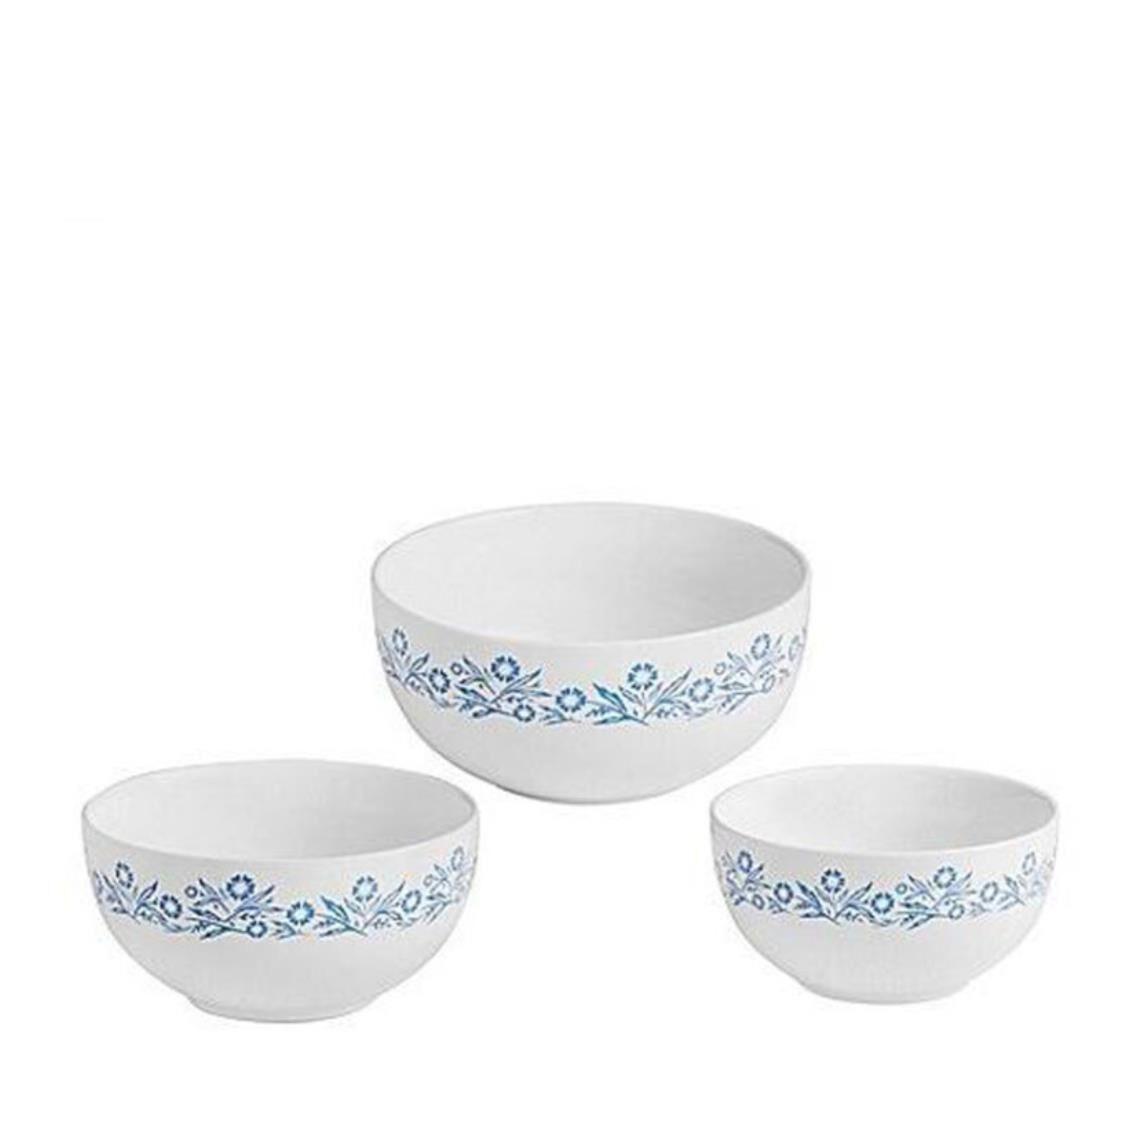 Corningware Blue Cornflower 3pc Mixing Bowl